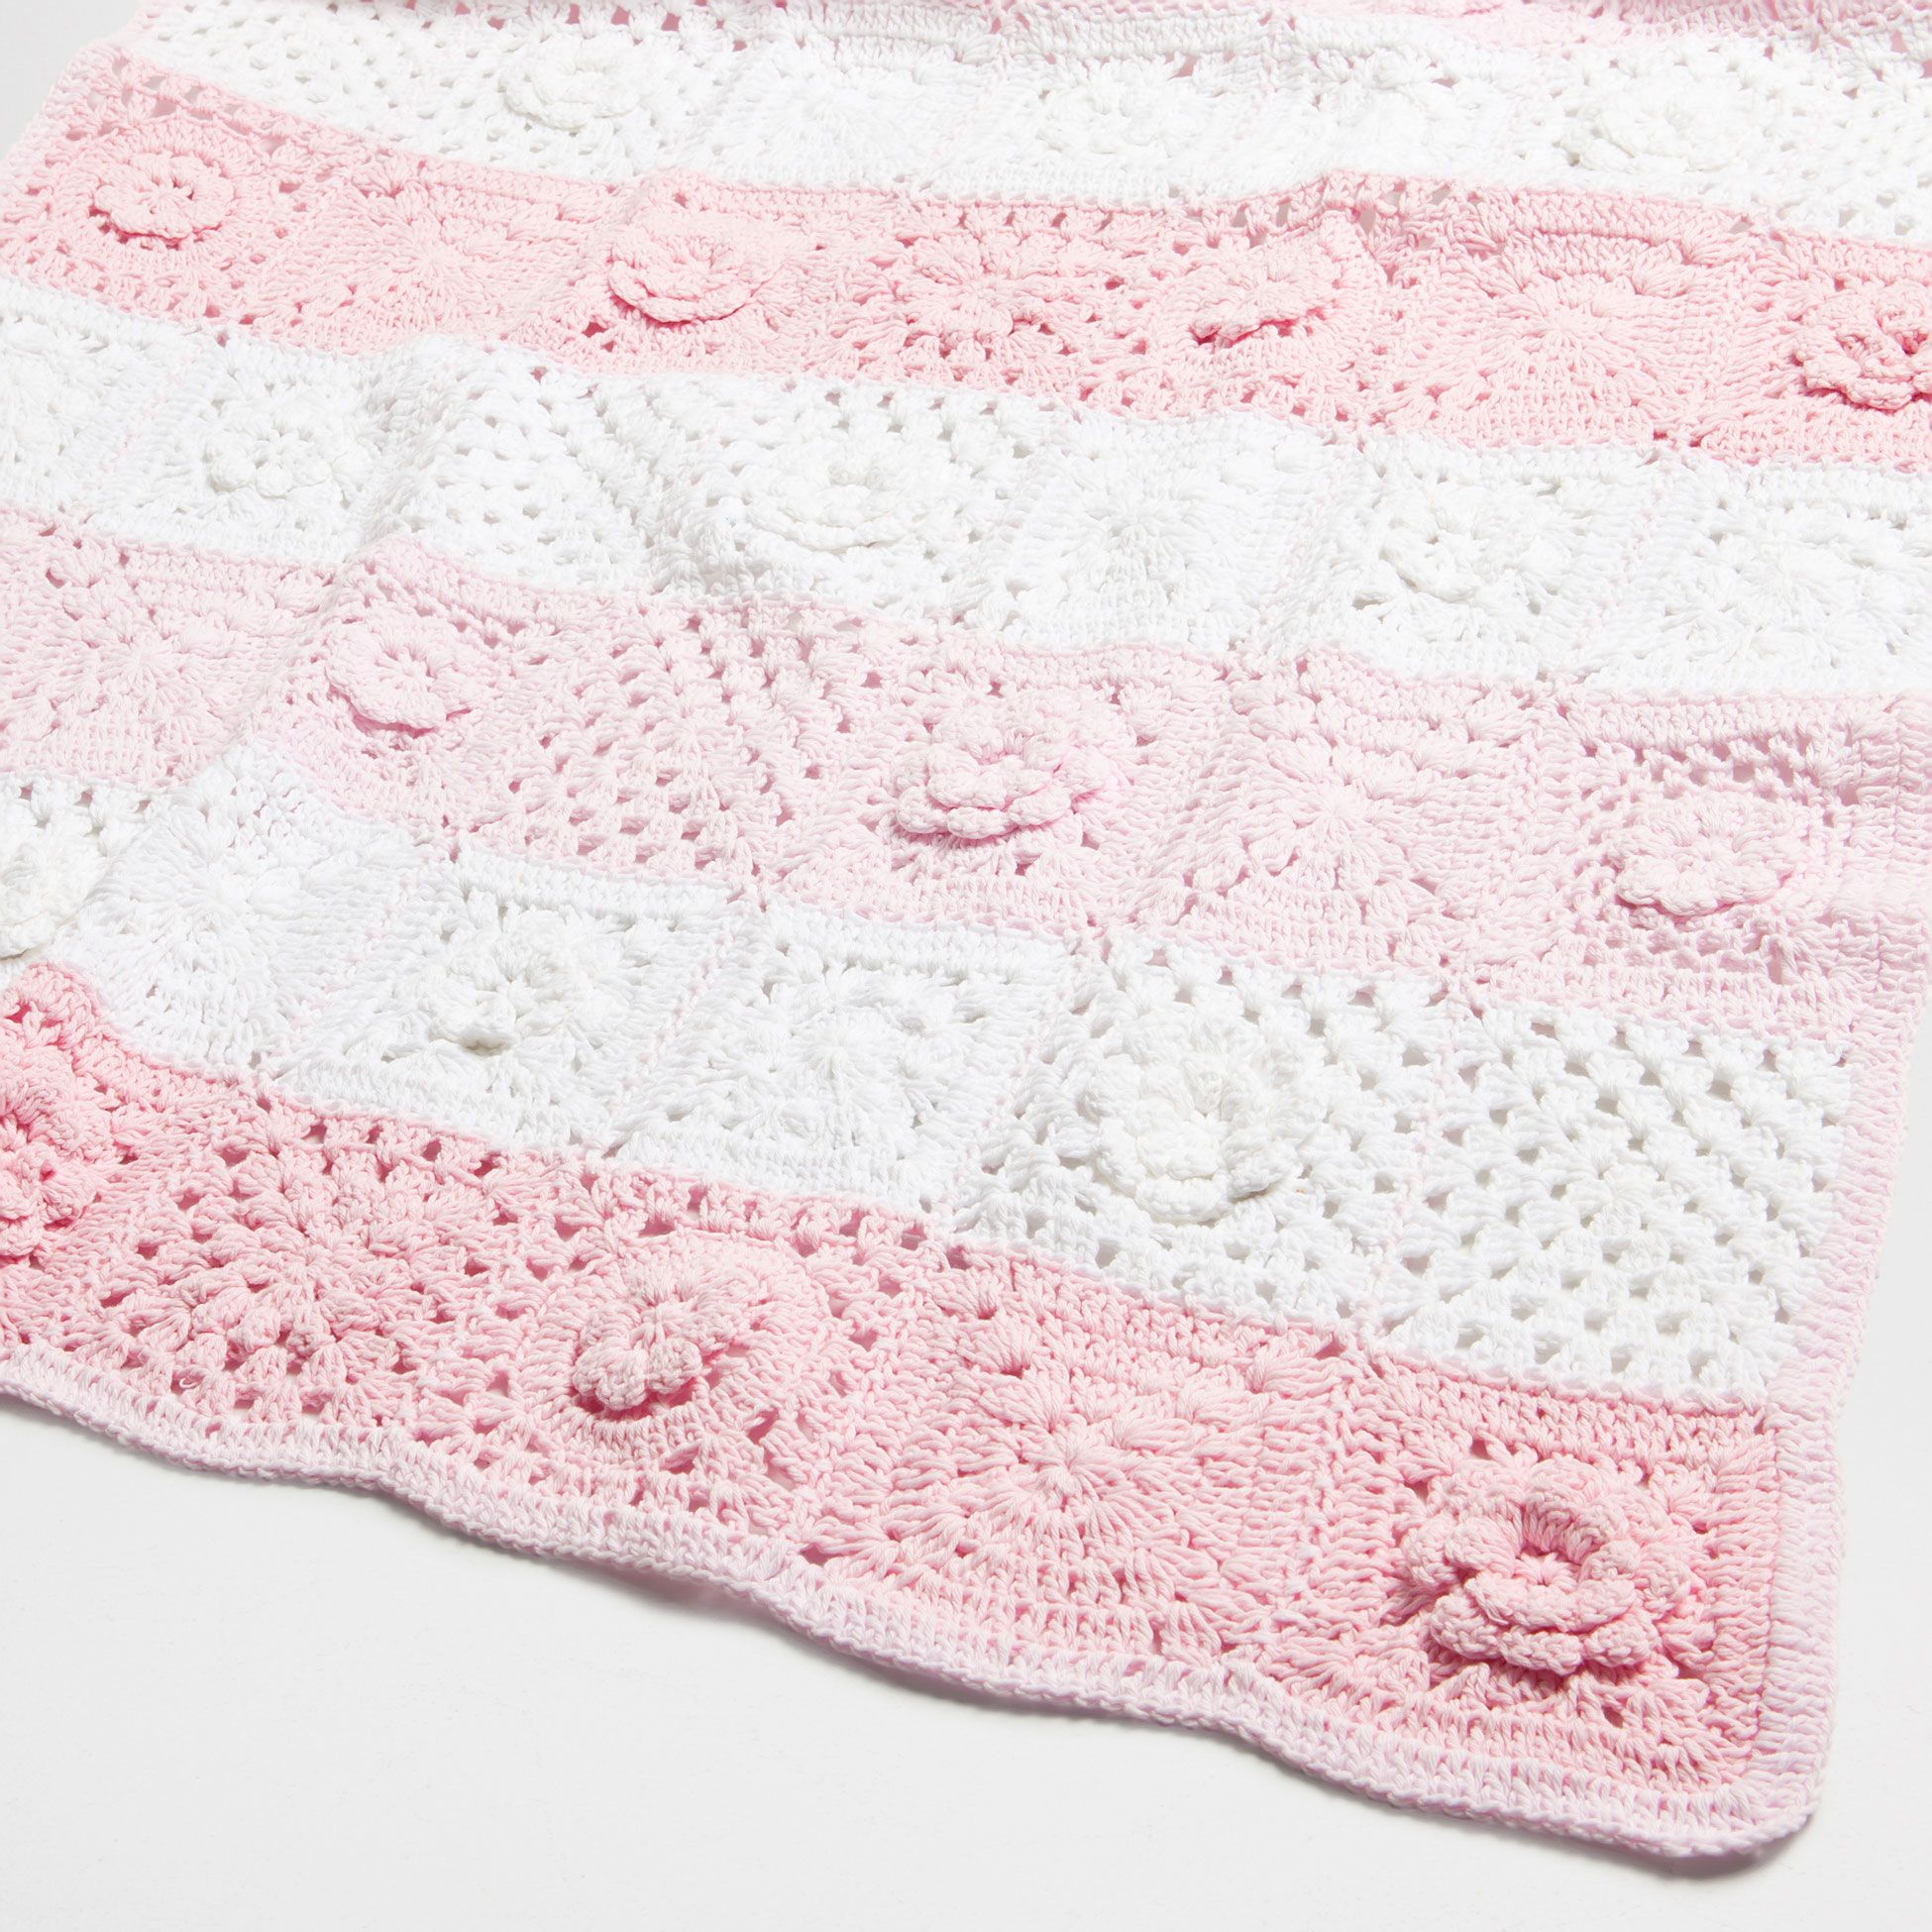 Manta Algodón Crochet - Mantas - Cama | Zara Home España | Mantas de ...